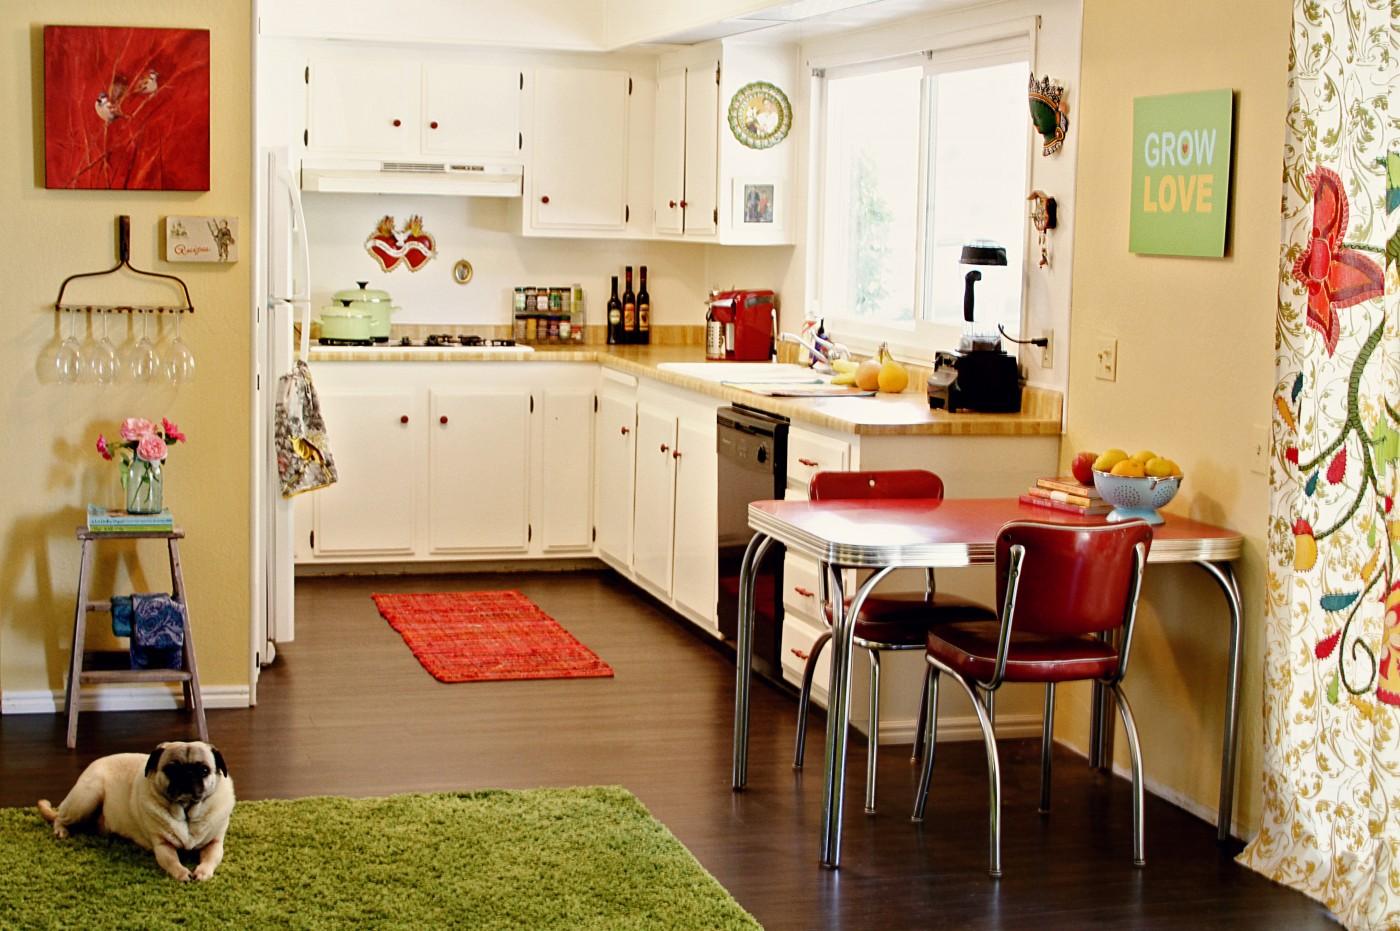 mobile home rental-orange accent rug in kitchen